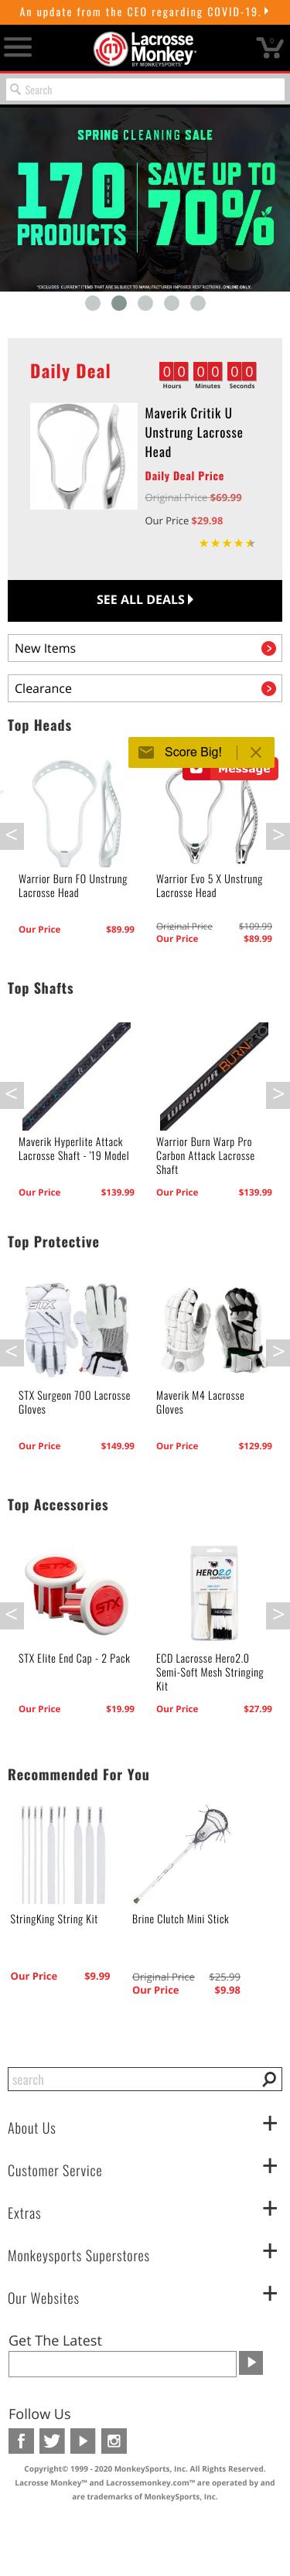 LacrosseMonkey.com Coupon